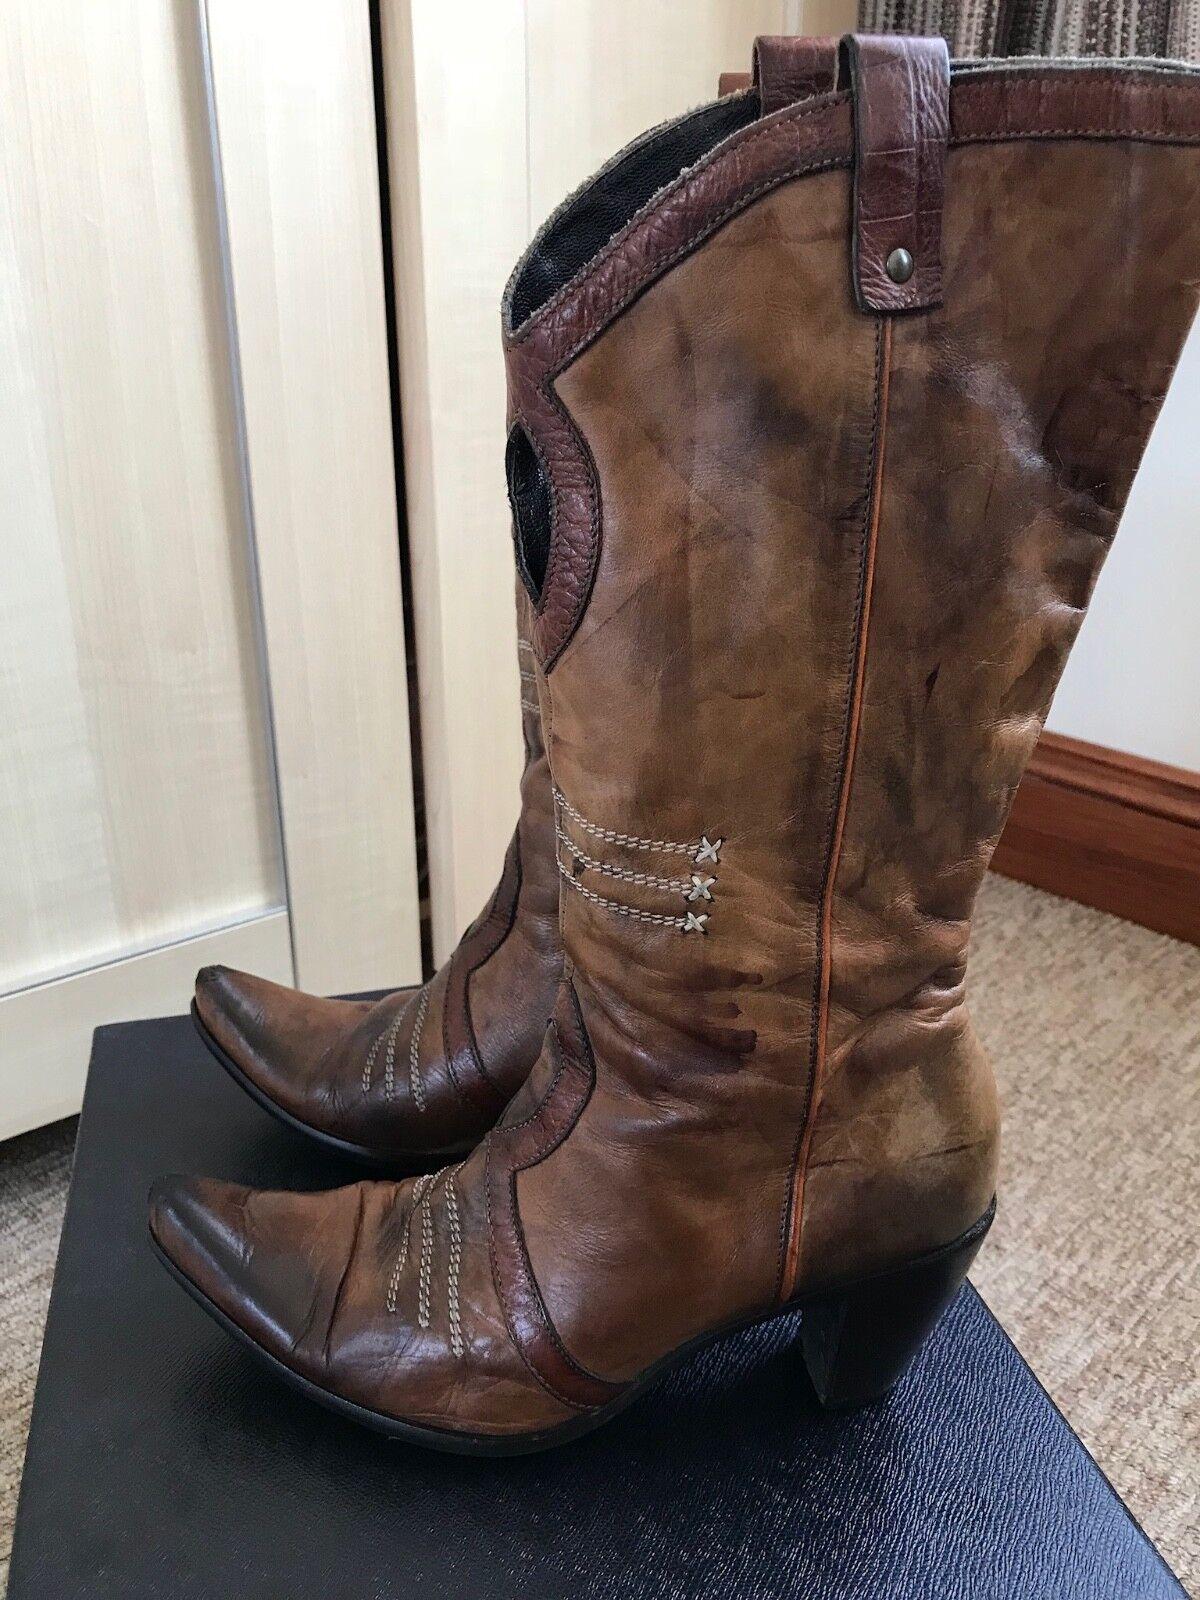 Vic Matie Leder Tan/Braun cowboy boots, 37, 4, 4.5, Made in